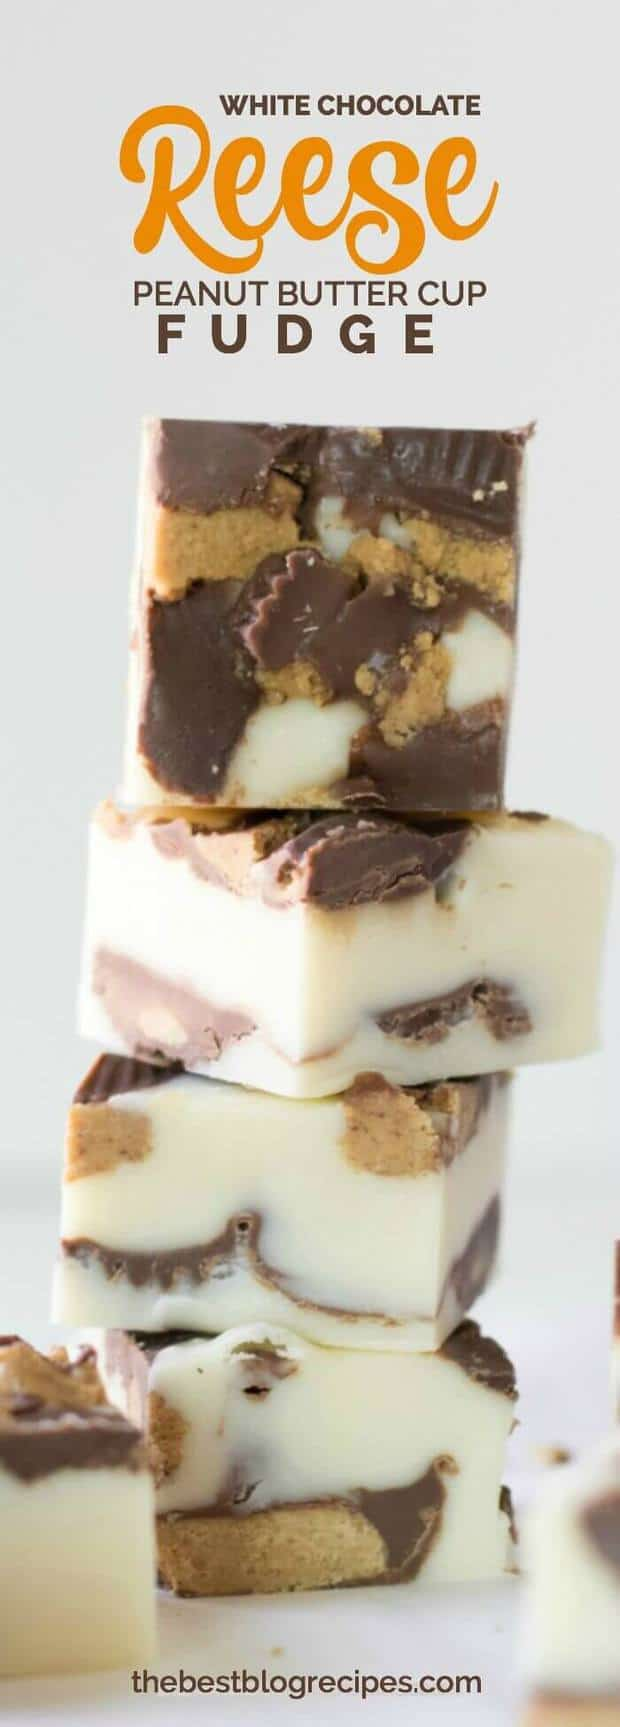 pinterest-white-chocolate-peanut-butter-cup-fudge